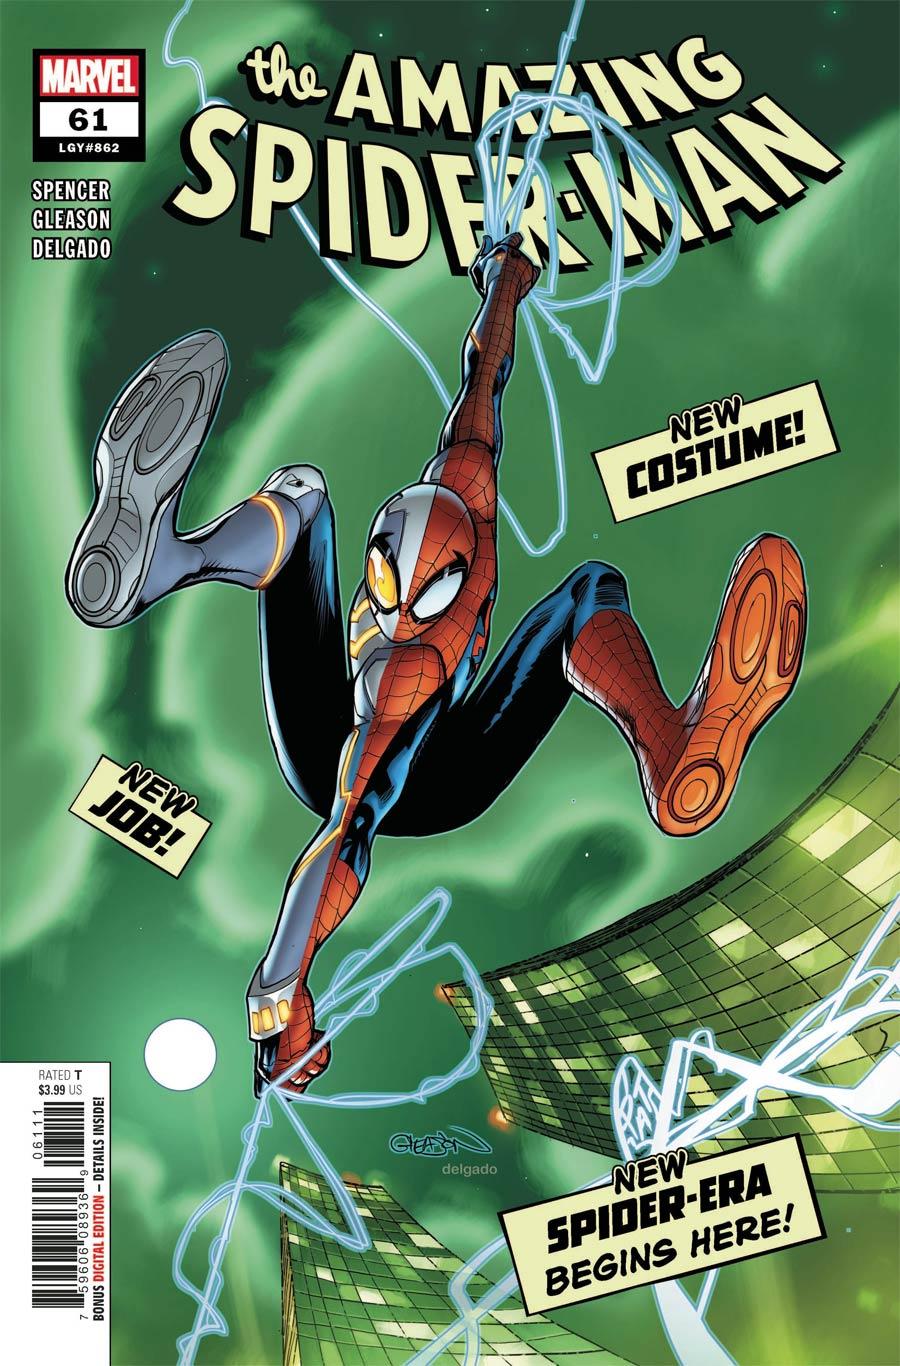 Amazing Spider-Man Vol 5 #61 Cover A Regular Patrick Gleason Cover